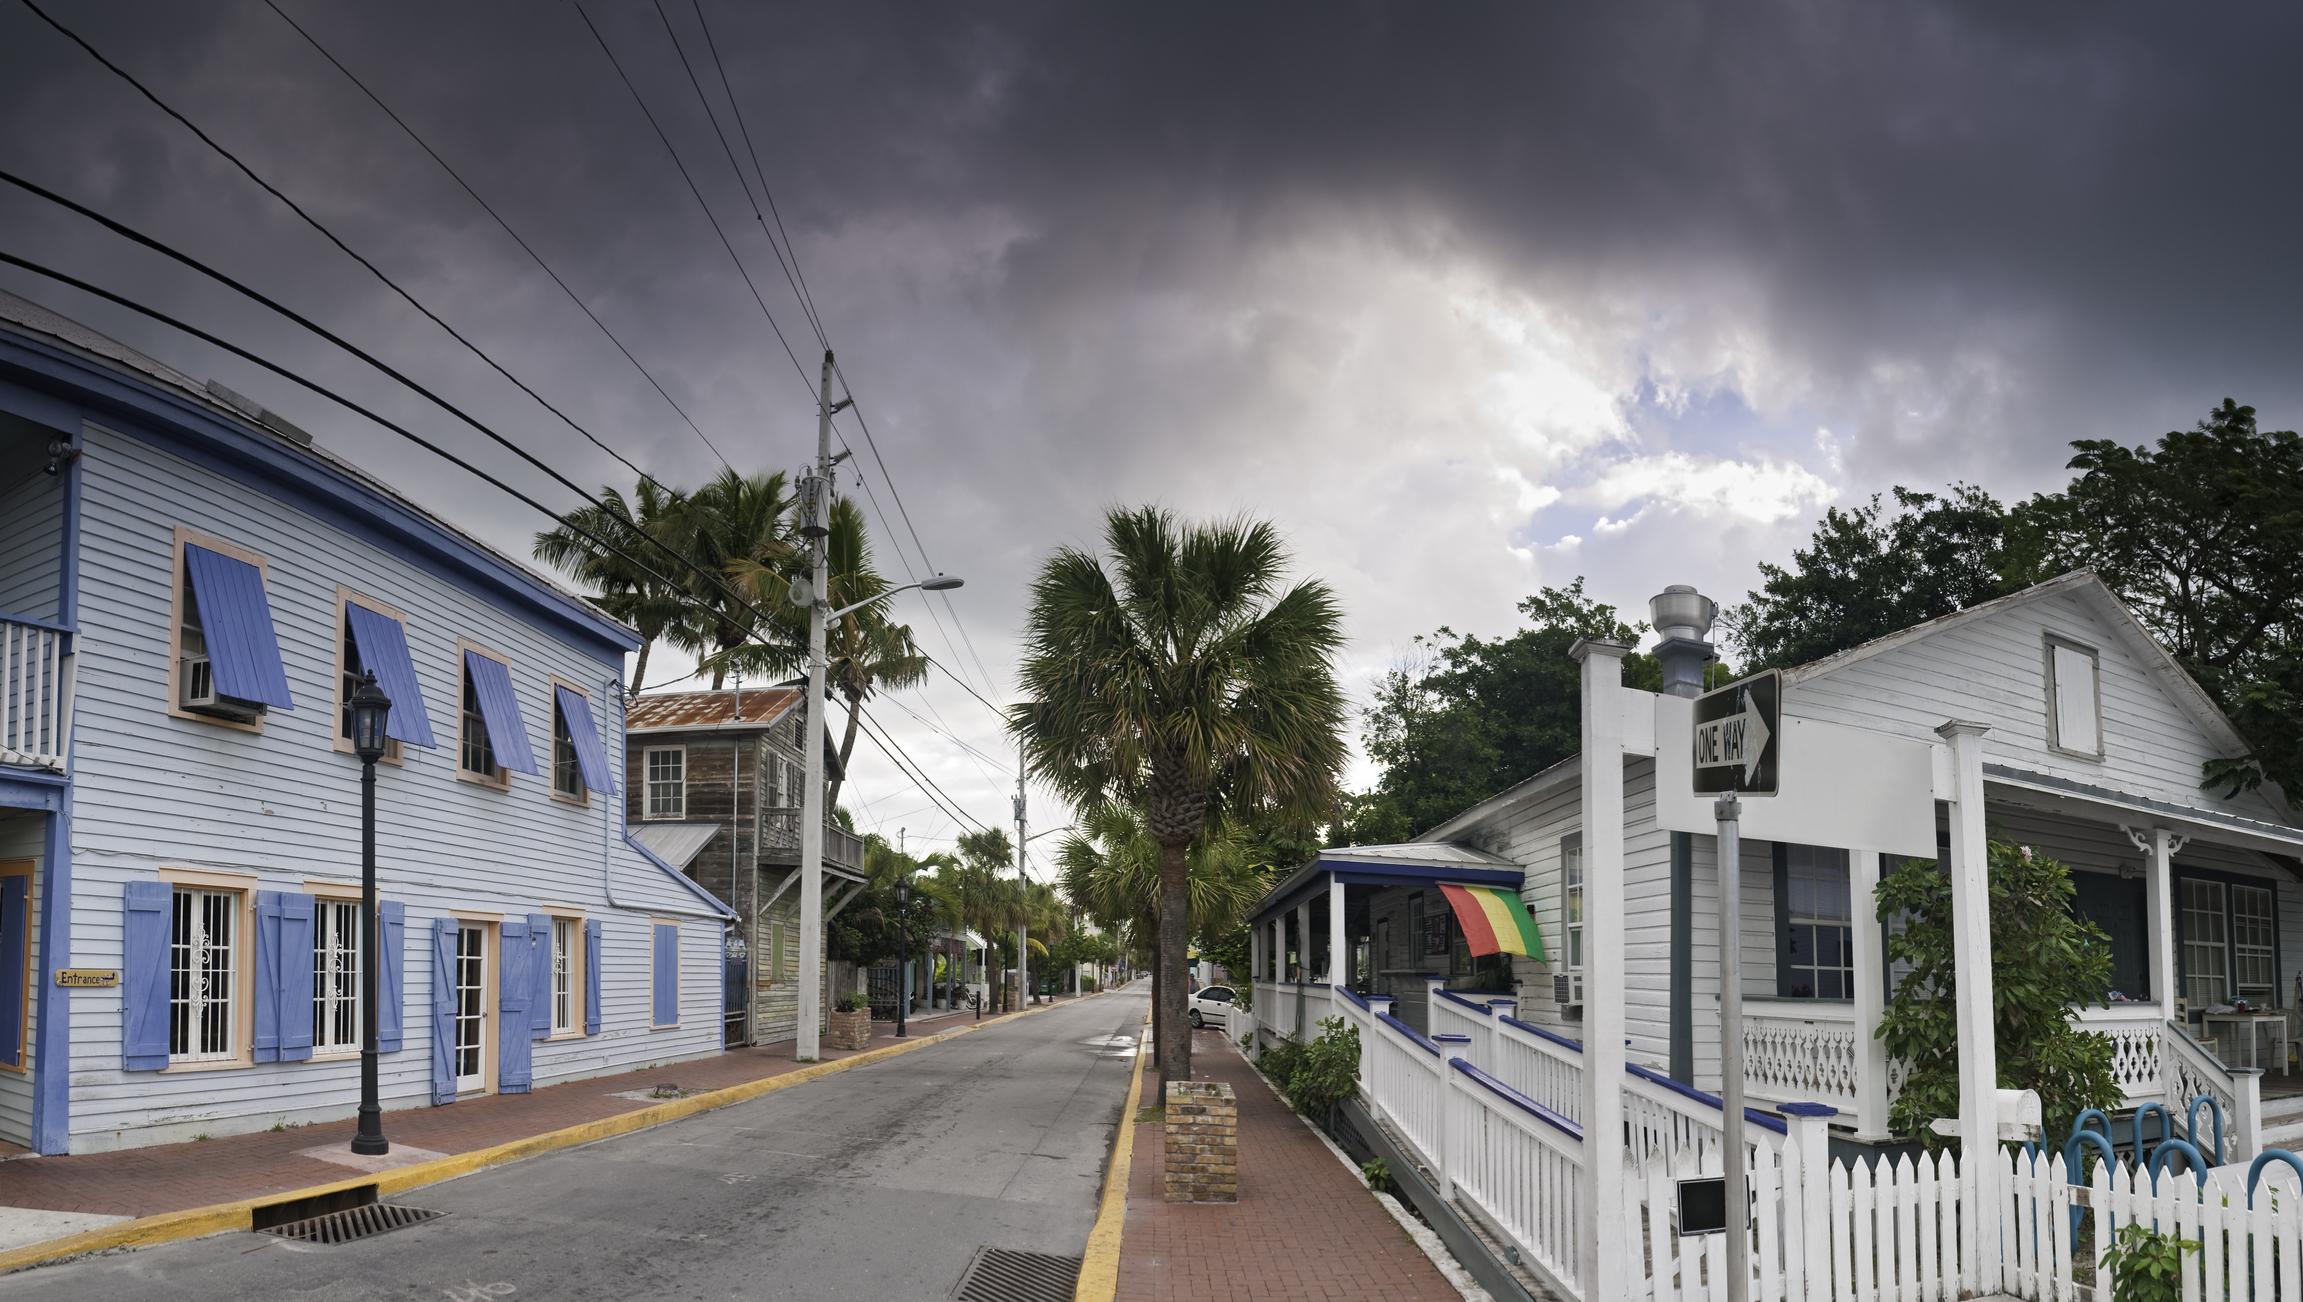 Hurricane Shutters in Florida